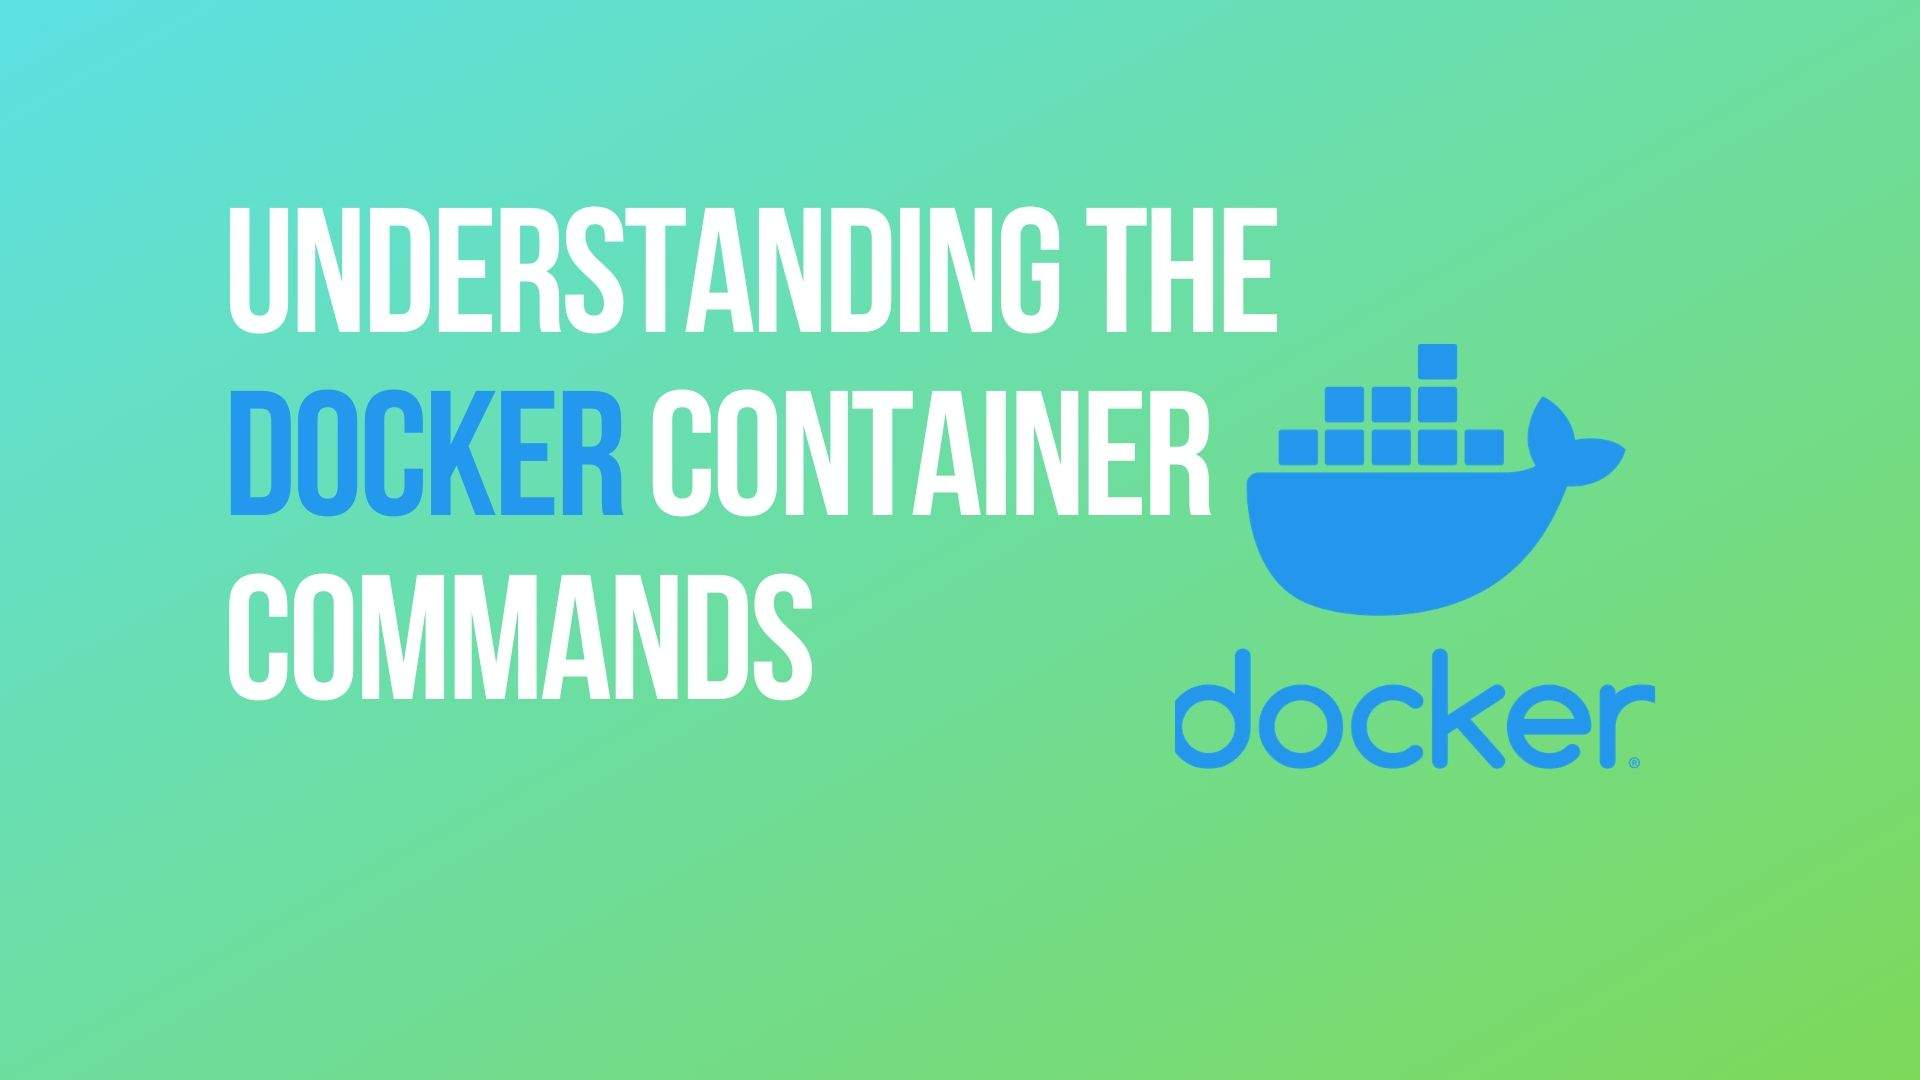 Understand the Docker Container Commands